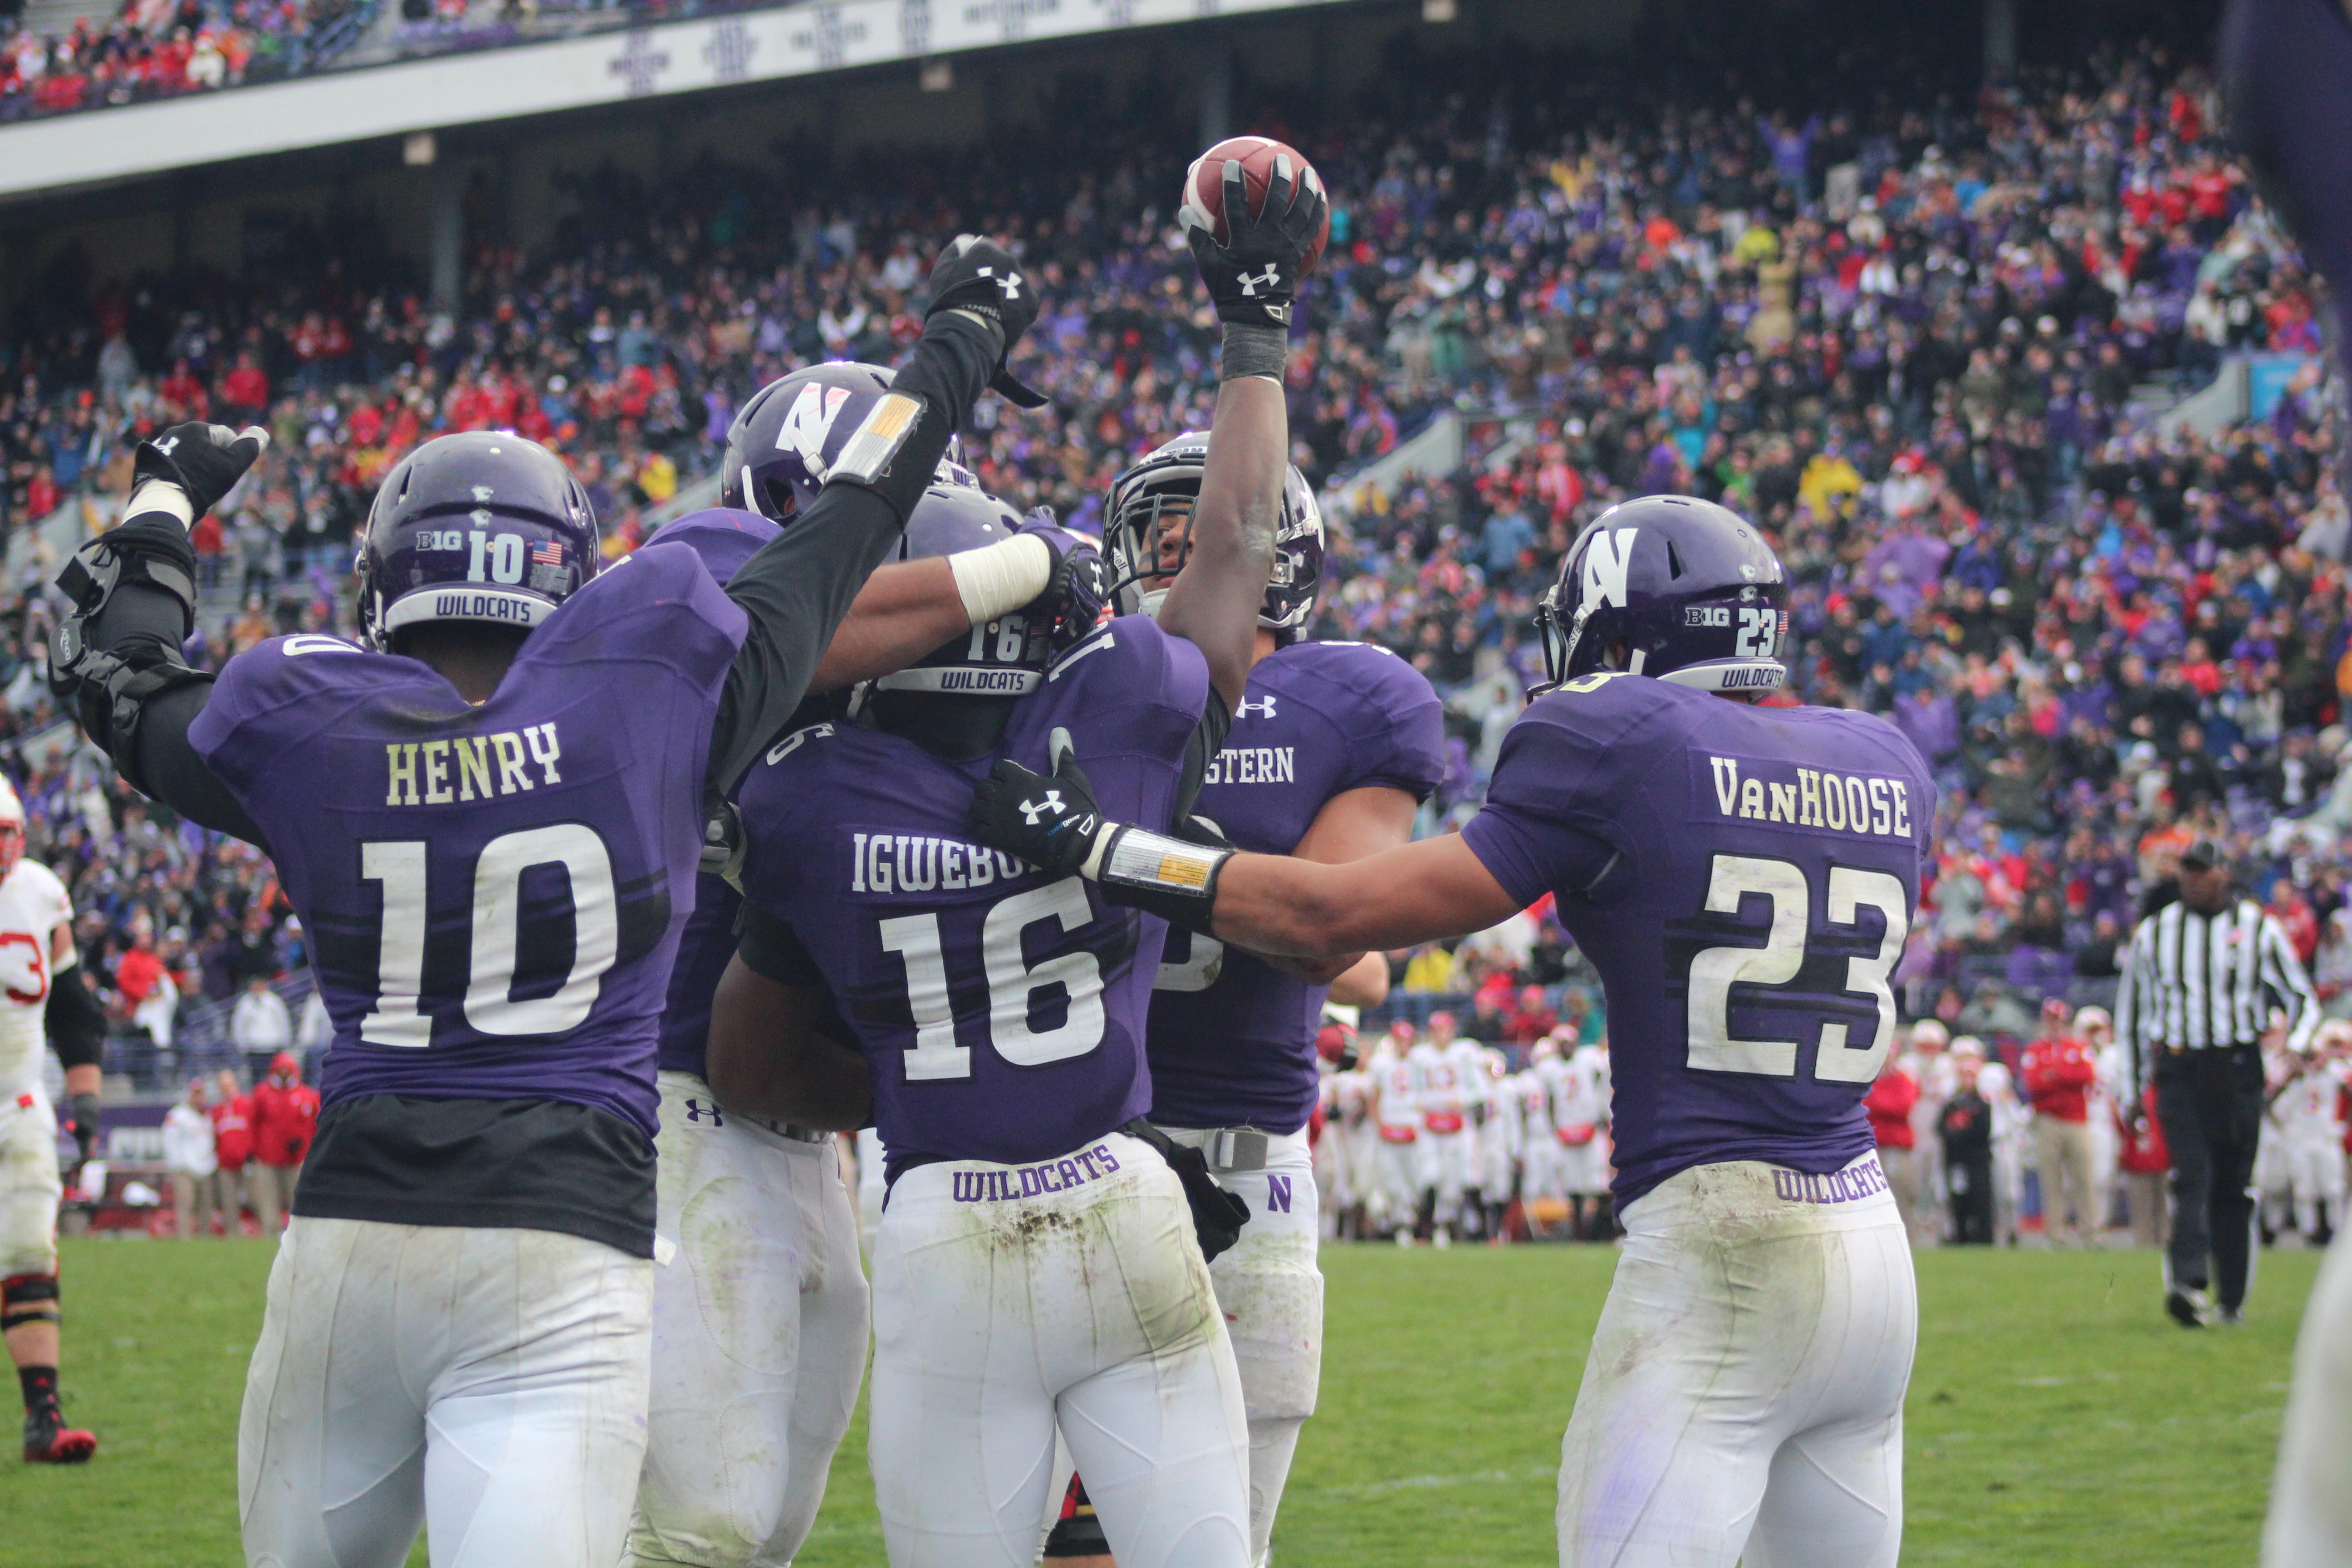 The Wildcats celebrate a Godwin Igwebuike interception against Wisconsin. Photo Credit: Mia Zanzucchi / North by Northwestern